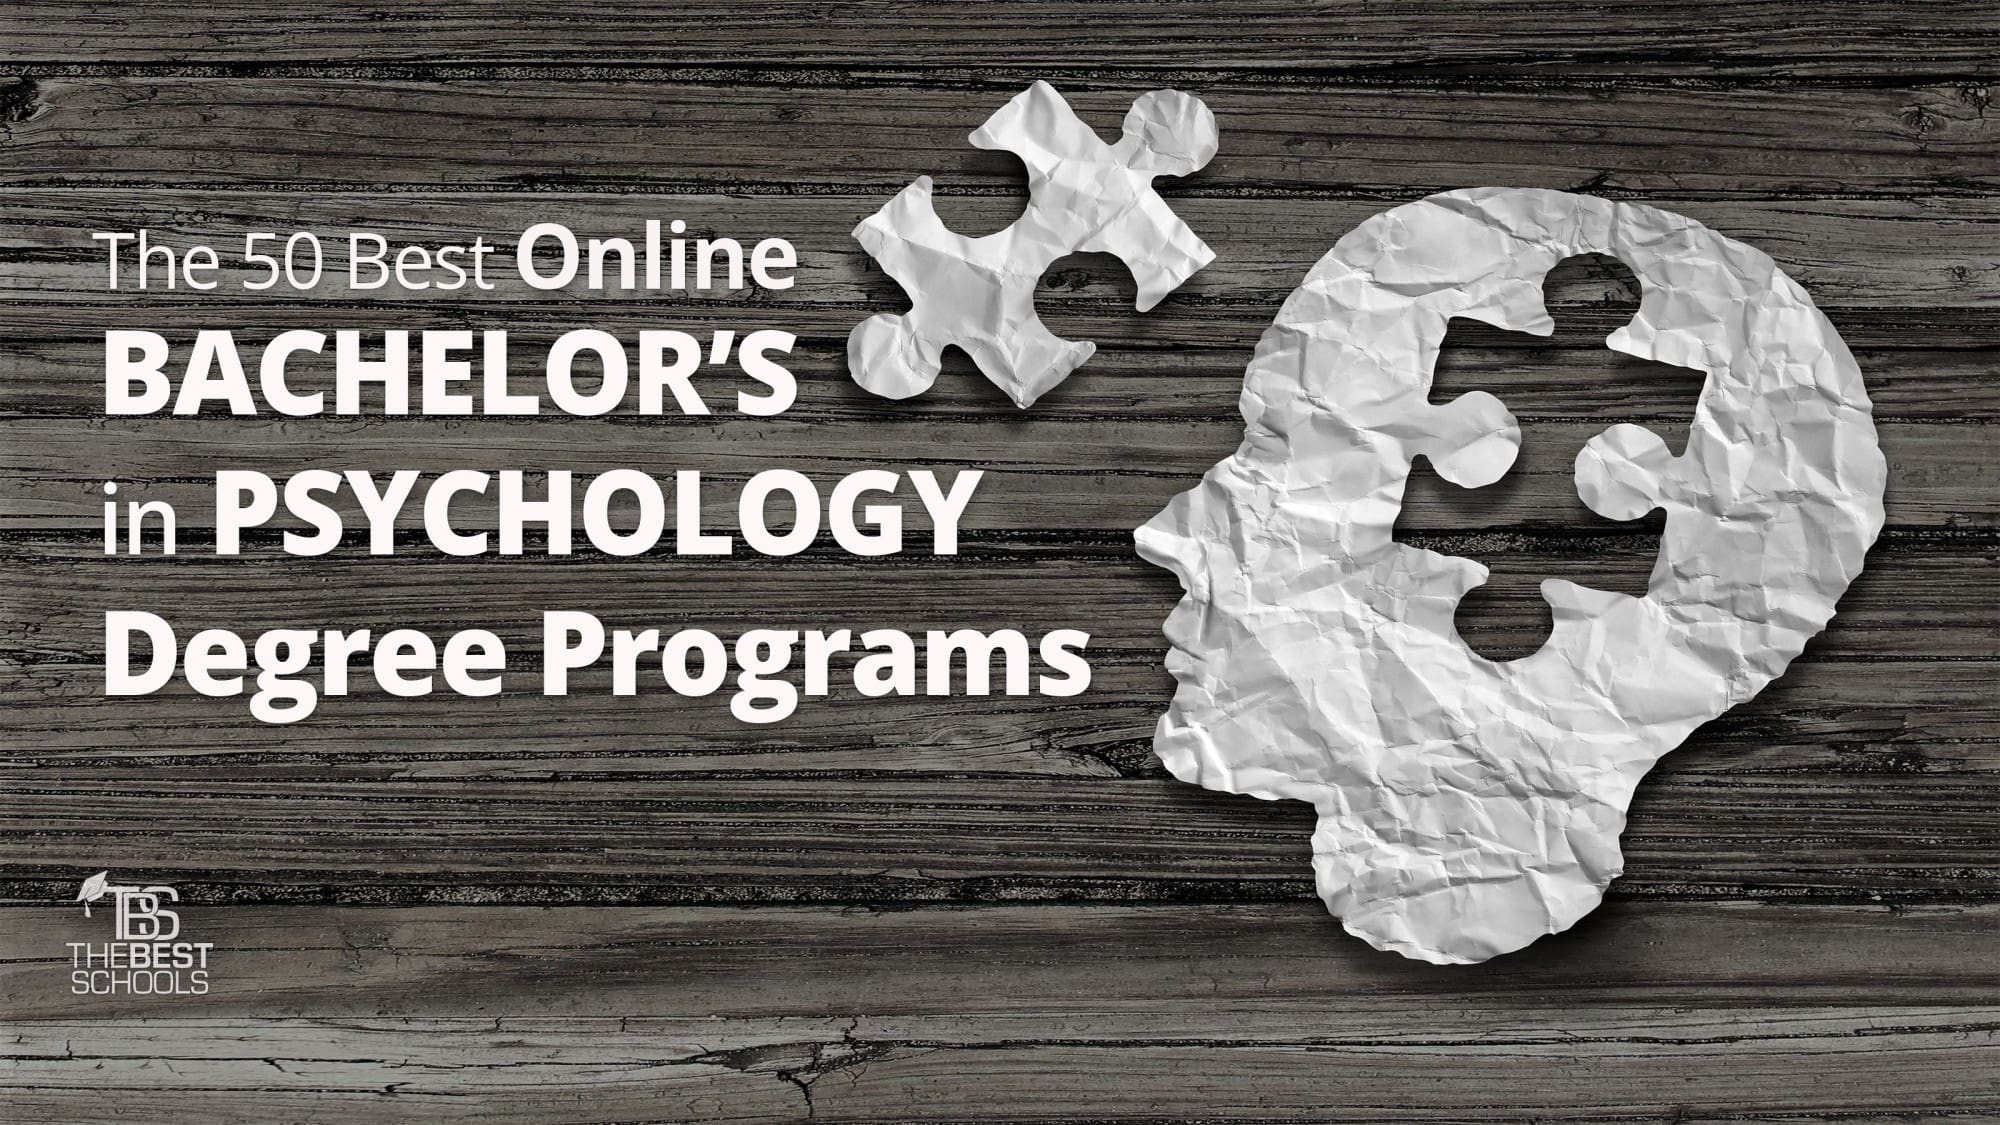 The 50 Best Online Bachelors In Psychology Degree Programs